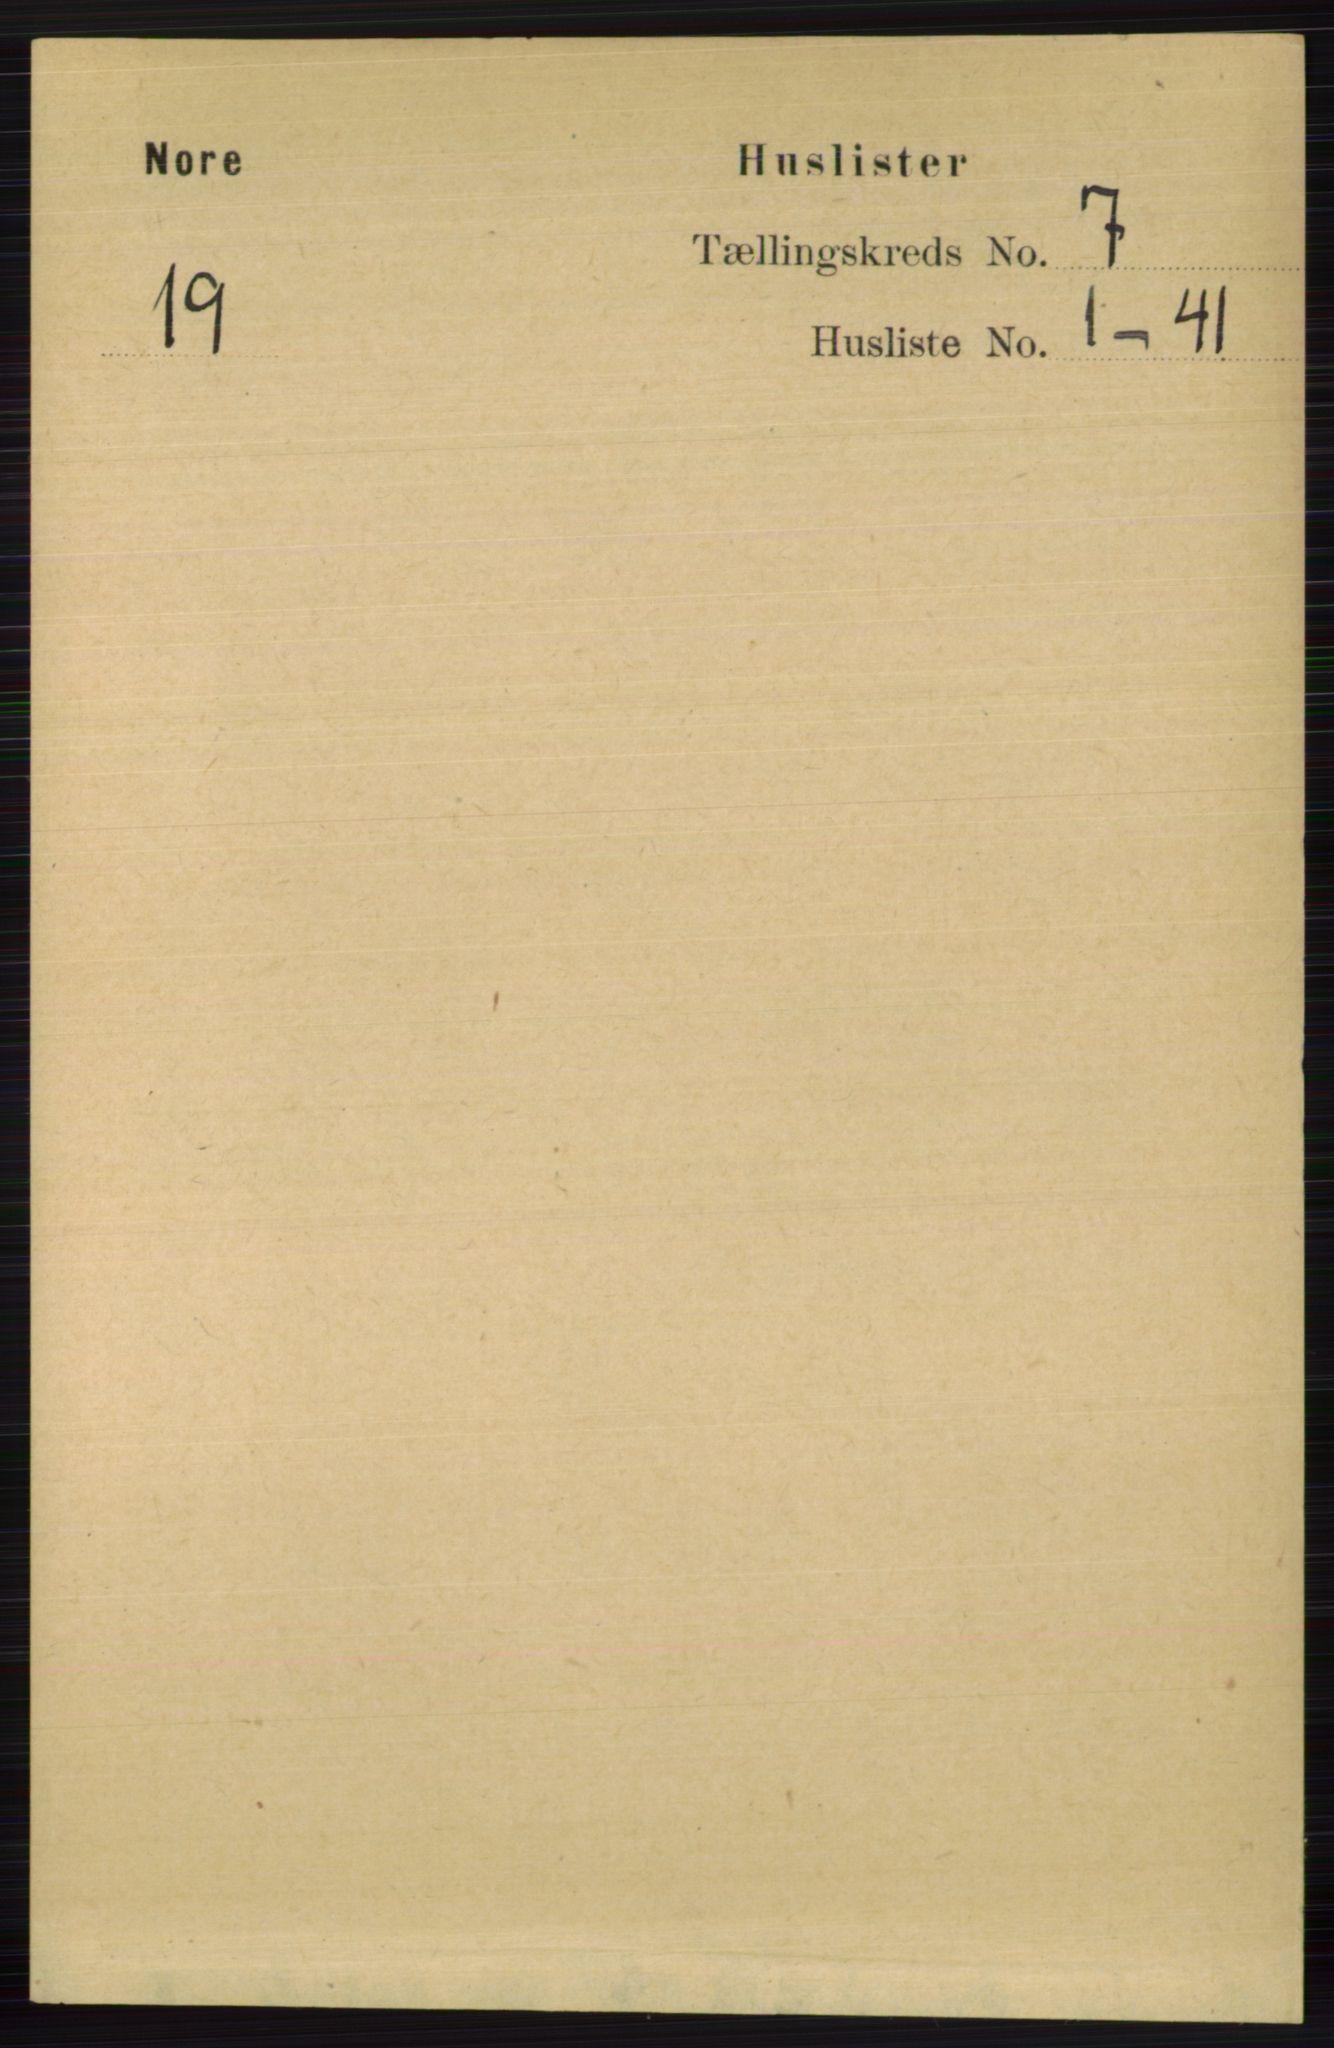 RA, Folketelling 1891 for 0633 Nore herred, 1891, s. 2562